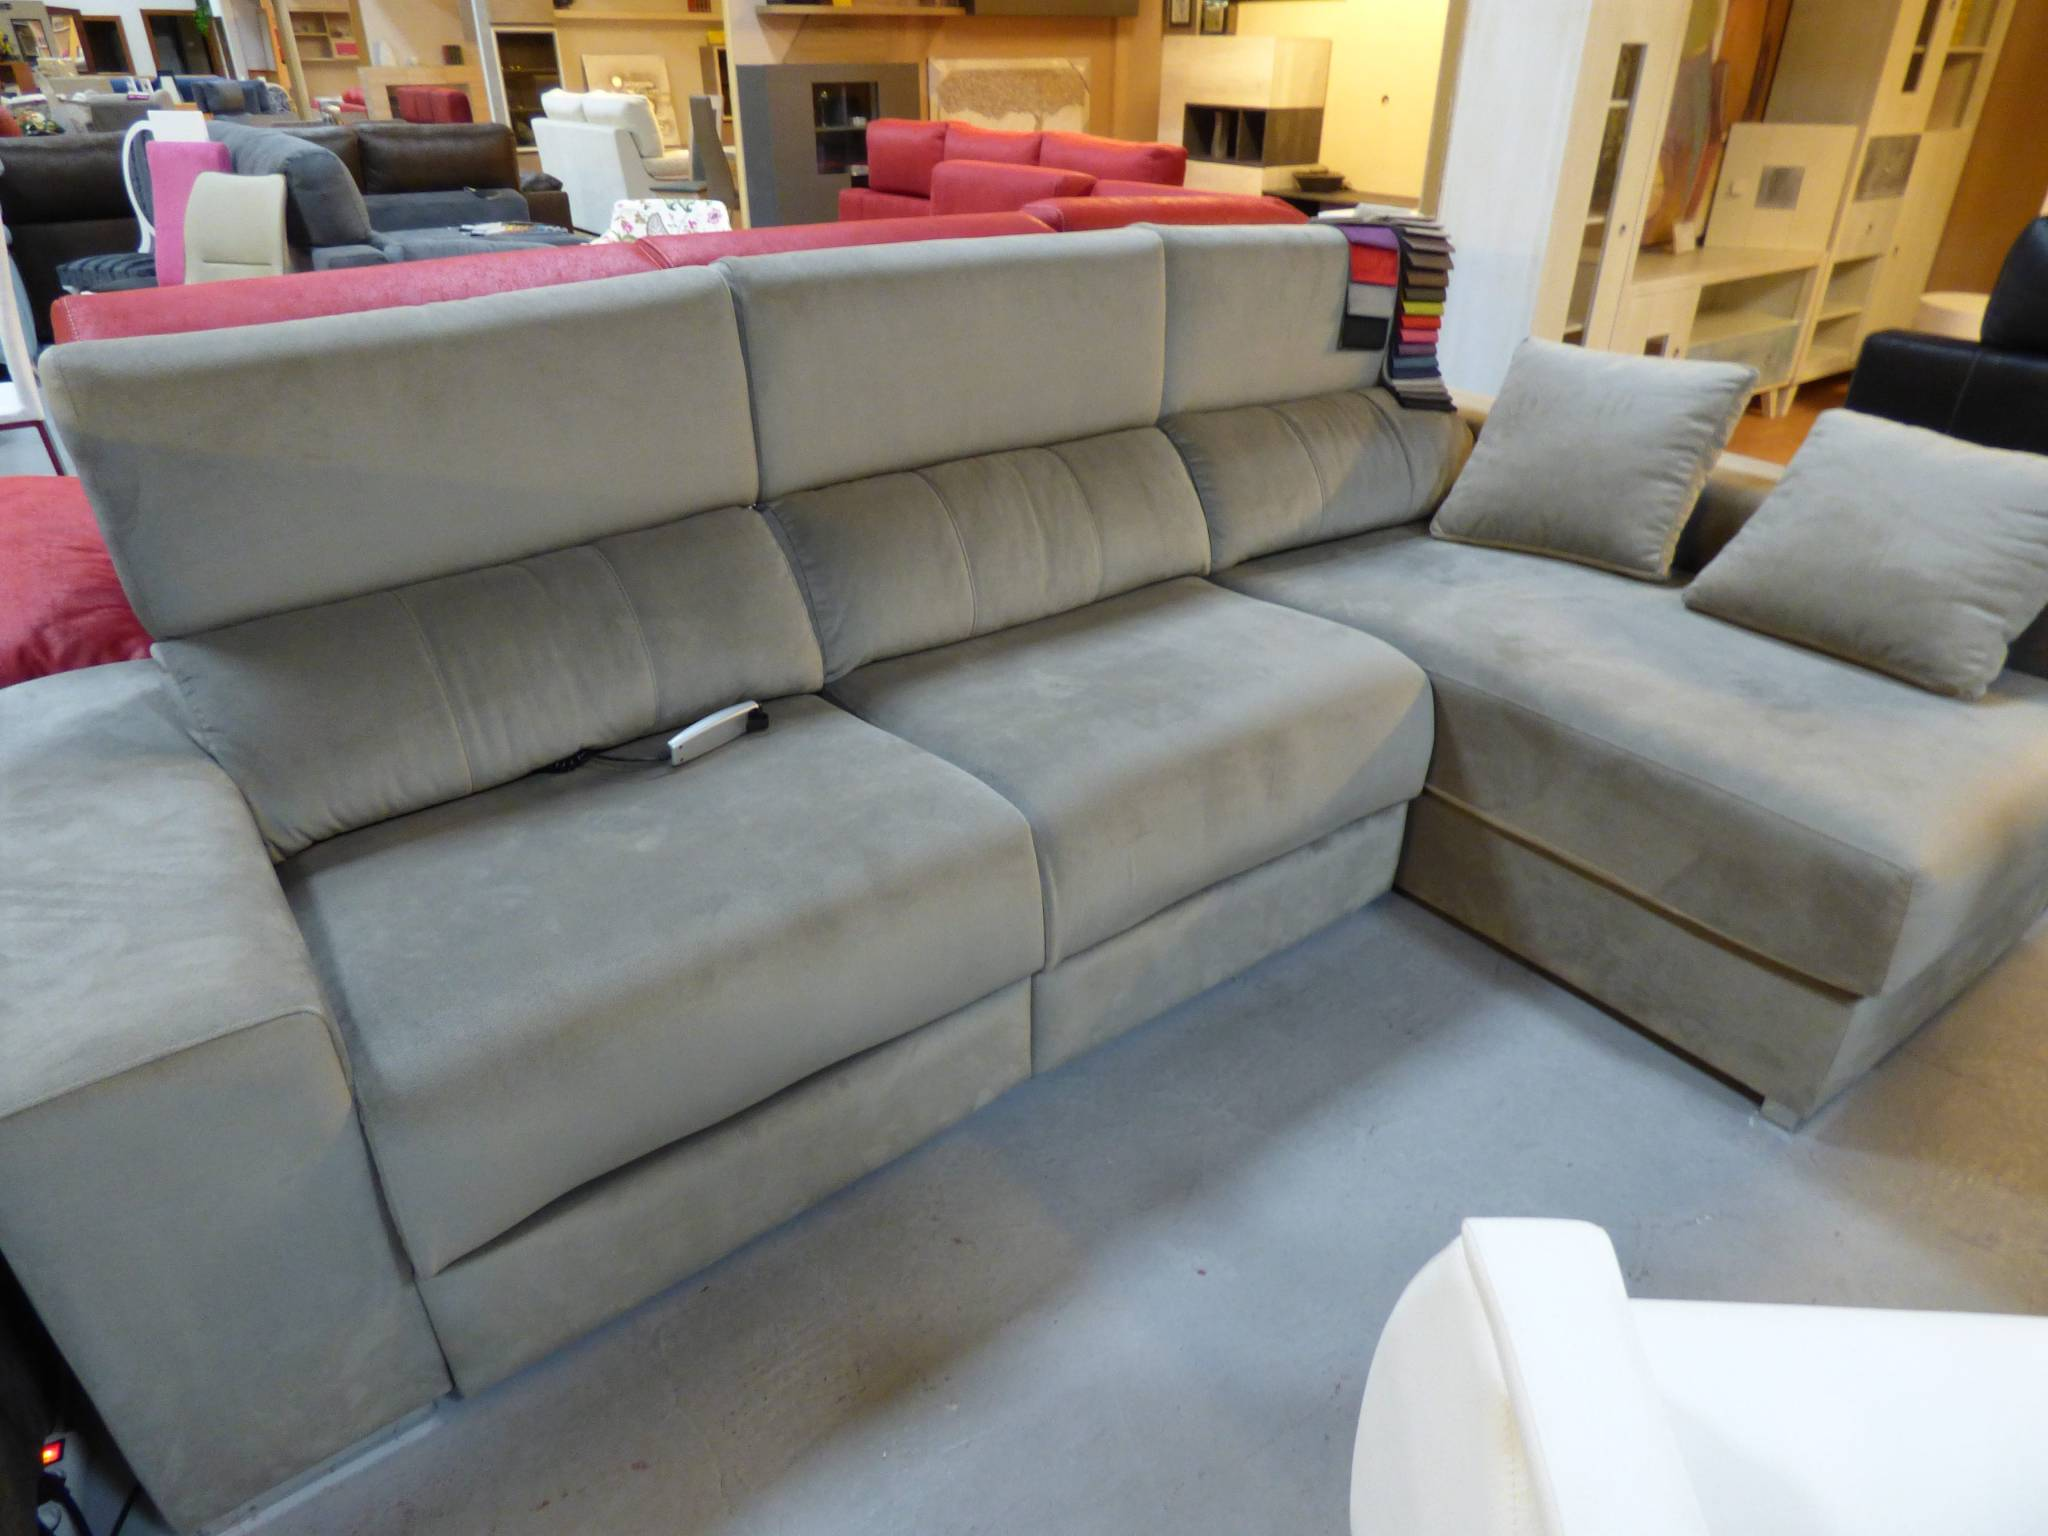 Chais longue en liquidacion muebles d azmuebles d az for Liquidacion sofas